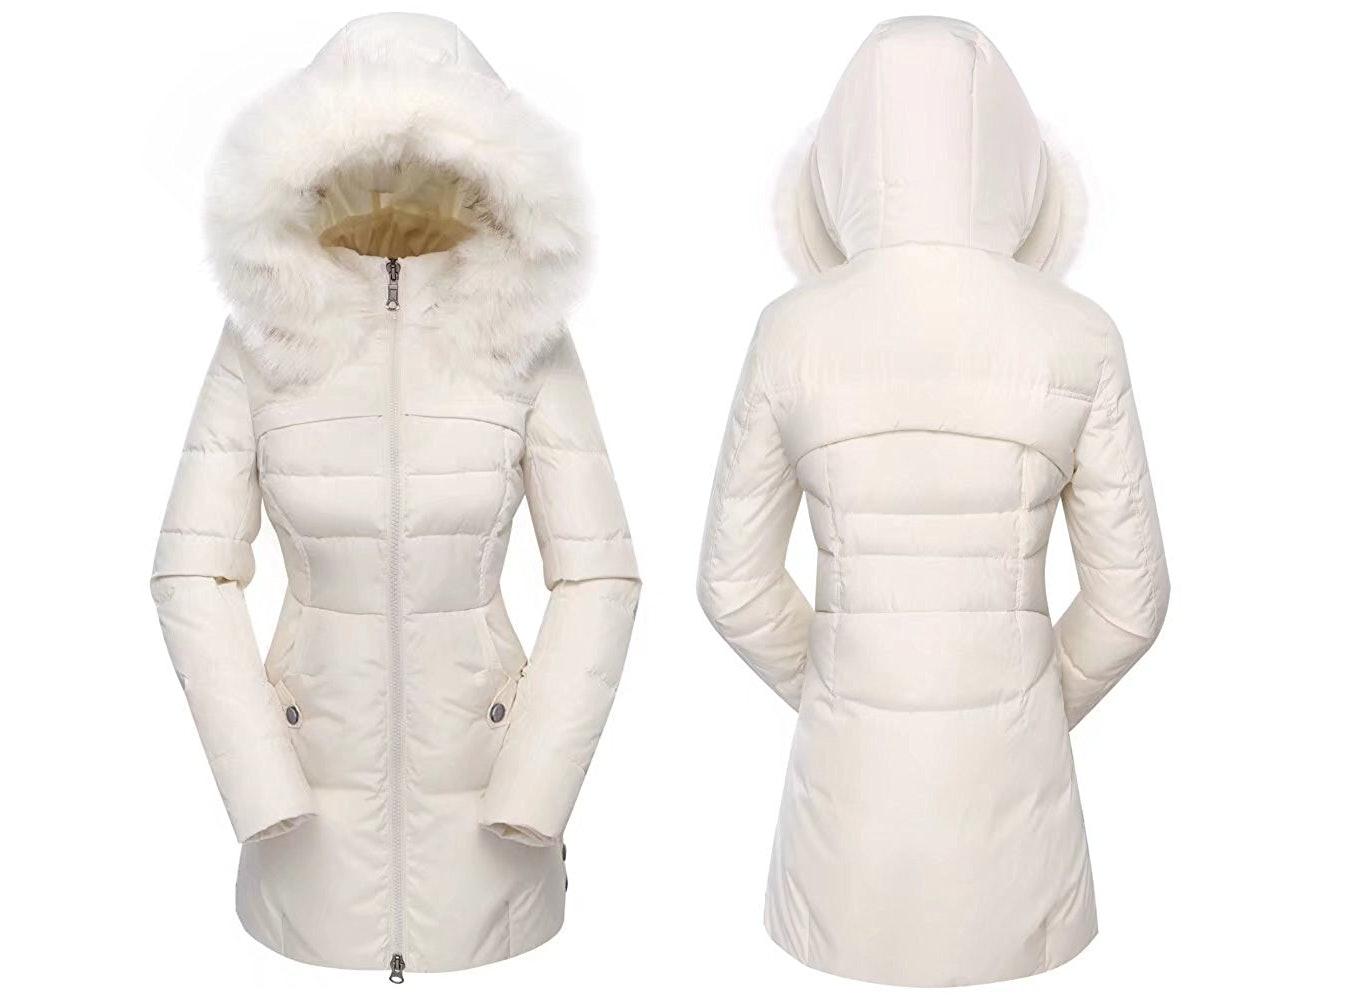 373860c4b 10 Warmest Women's Winter Coats Under $100